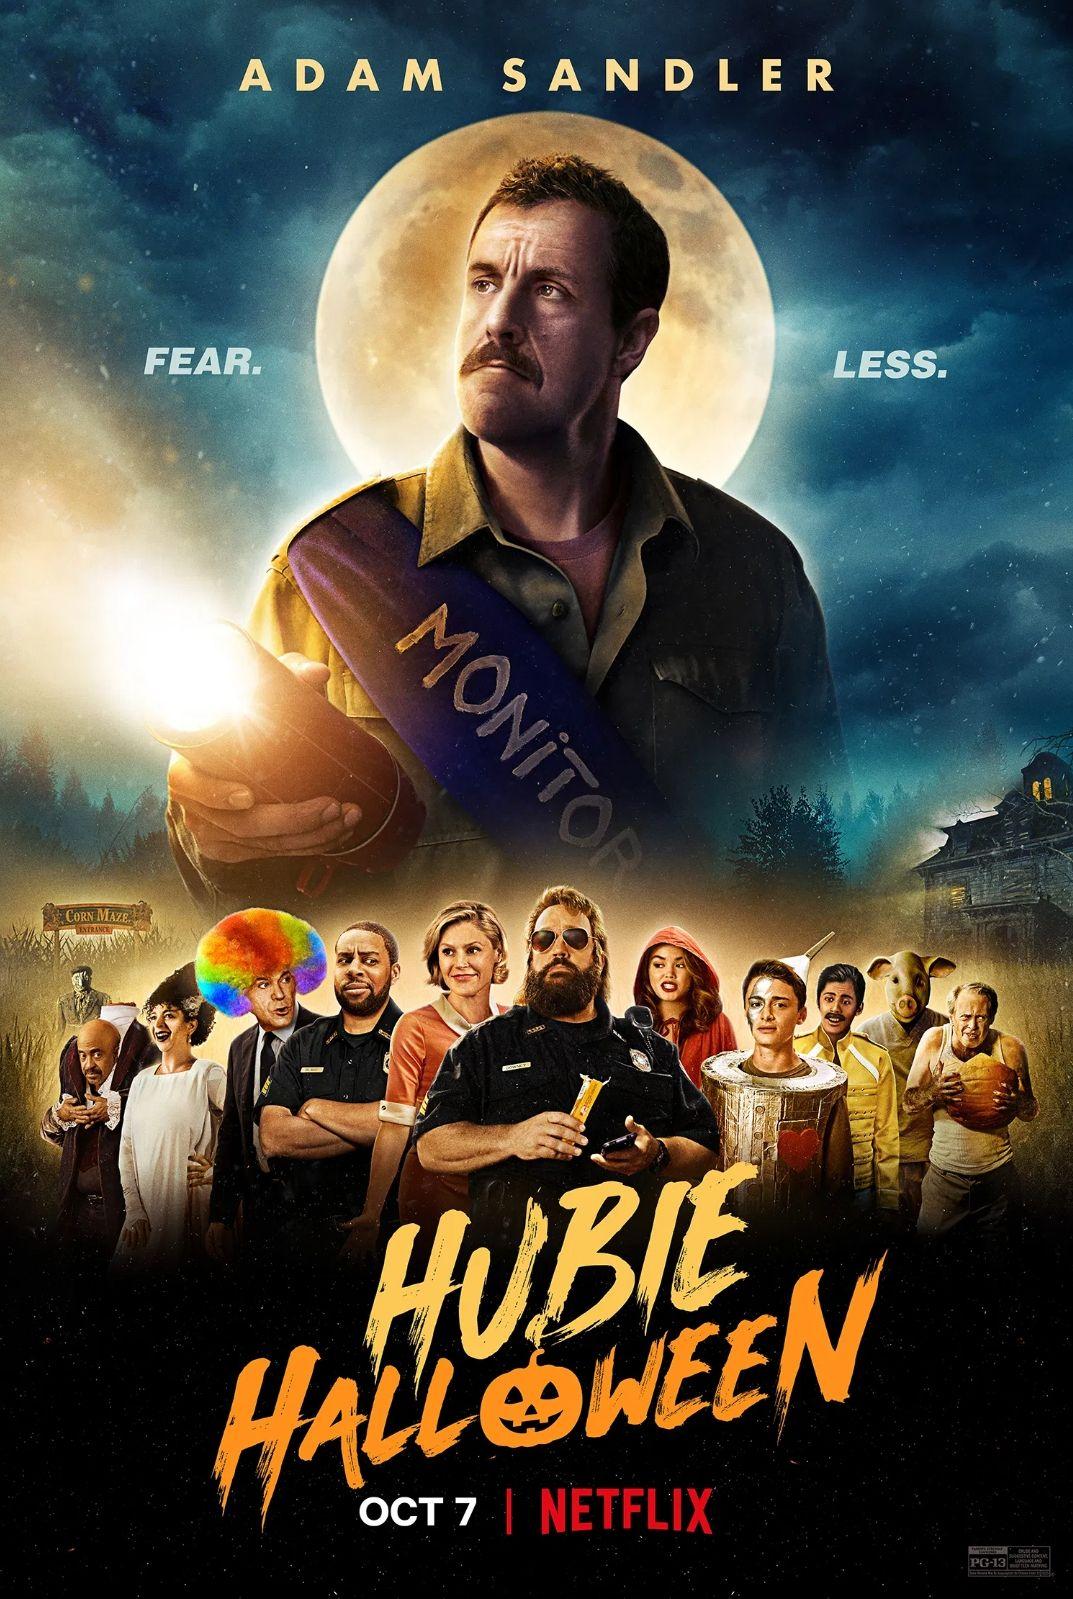 Hubie Halloween Poster In 2020 Adam Sandler Netflix Original Movies Halloween Movies